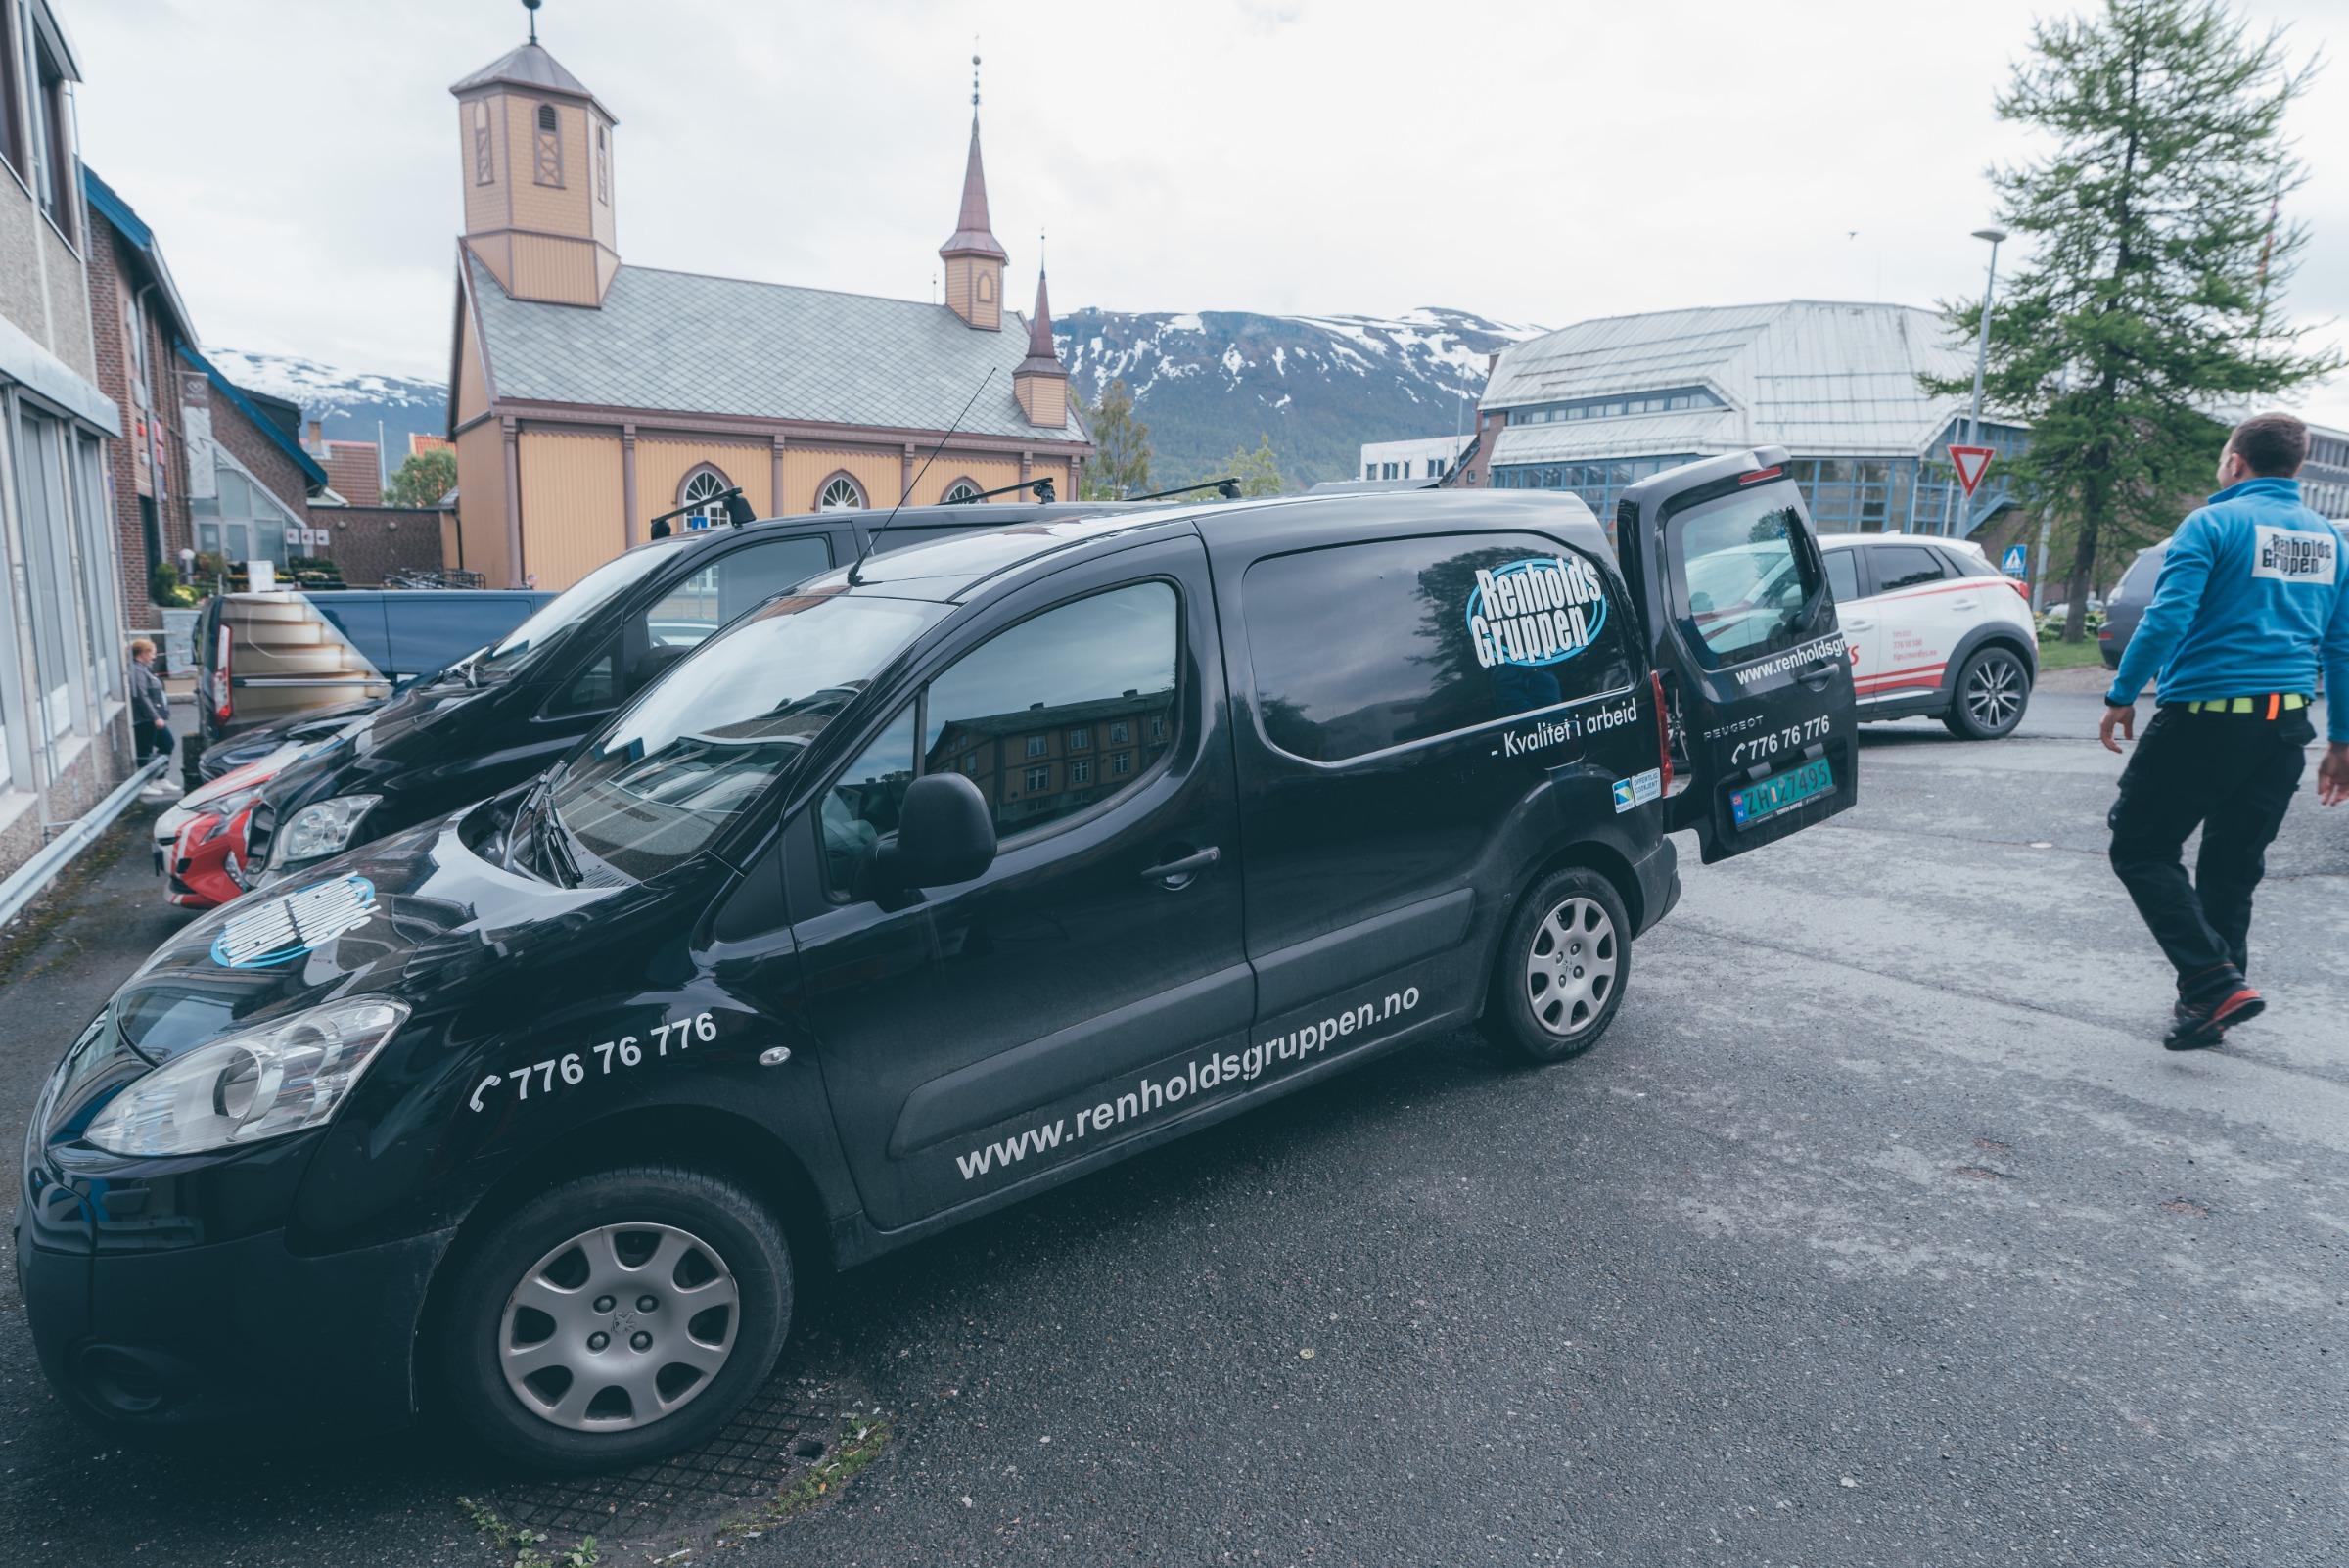 Renholdsgruppen bil i Tromsø sentrum